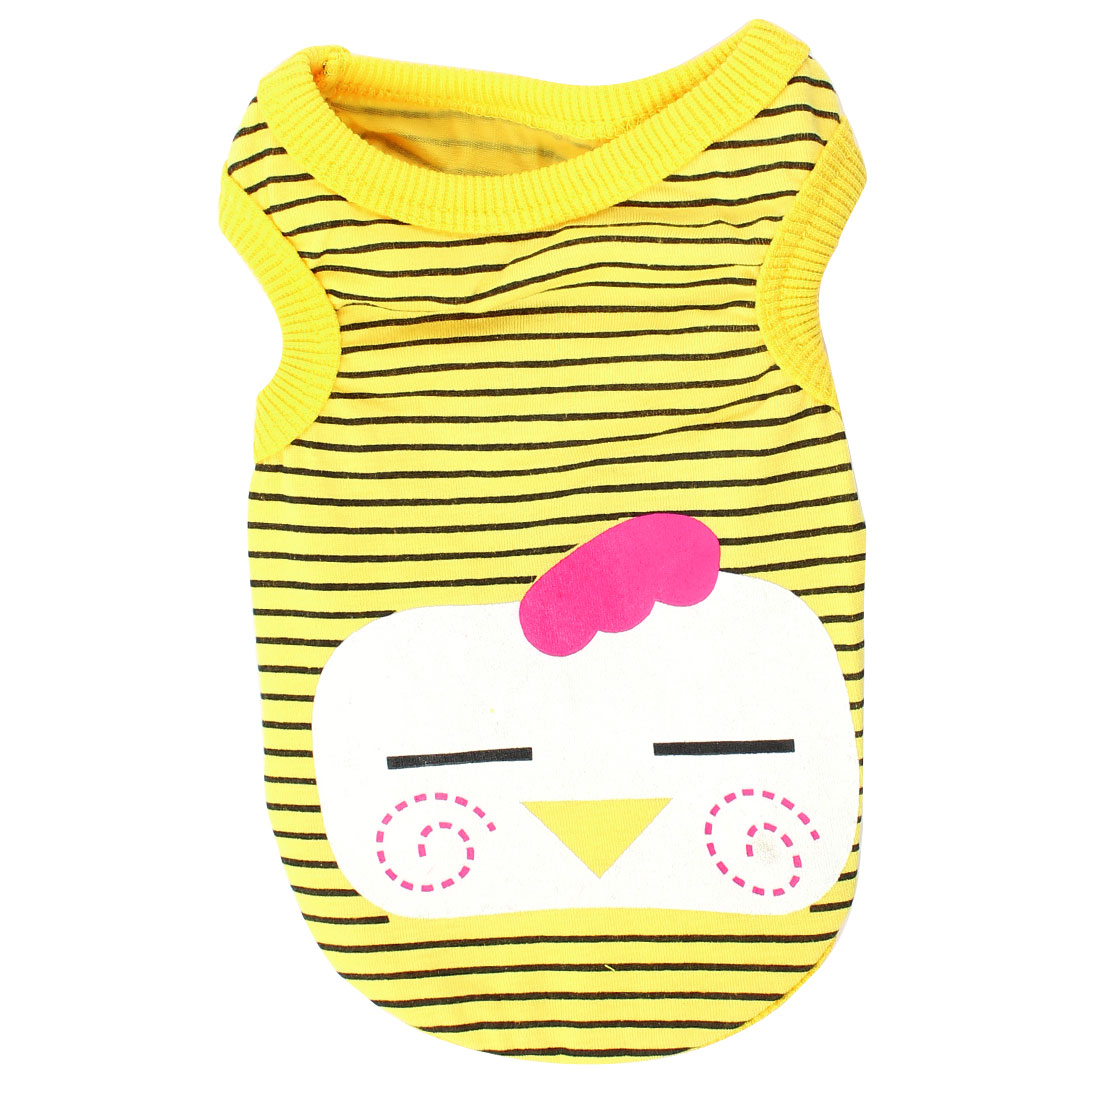 Round Collar Smile Face Print Pet Dog Puppy T-shirt Clothing Yellow Black XS